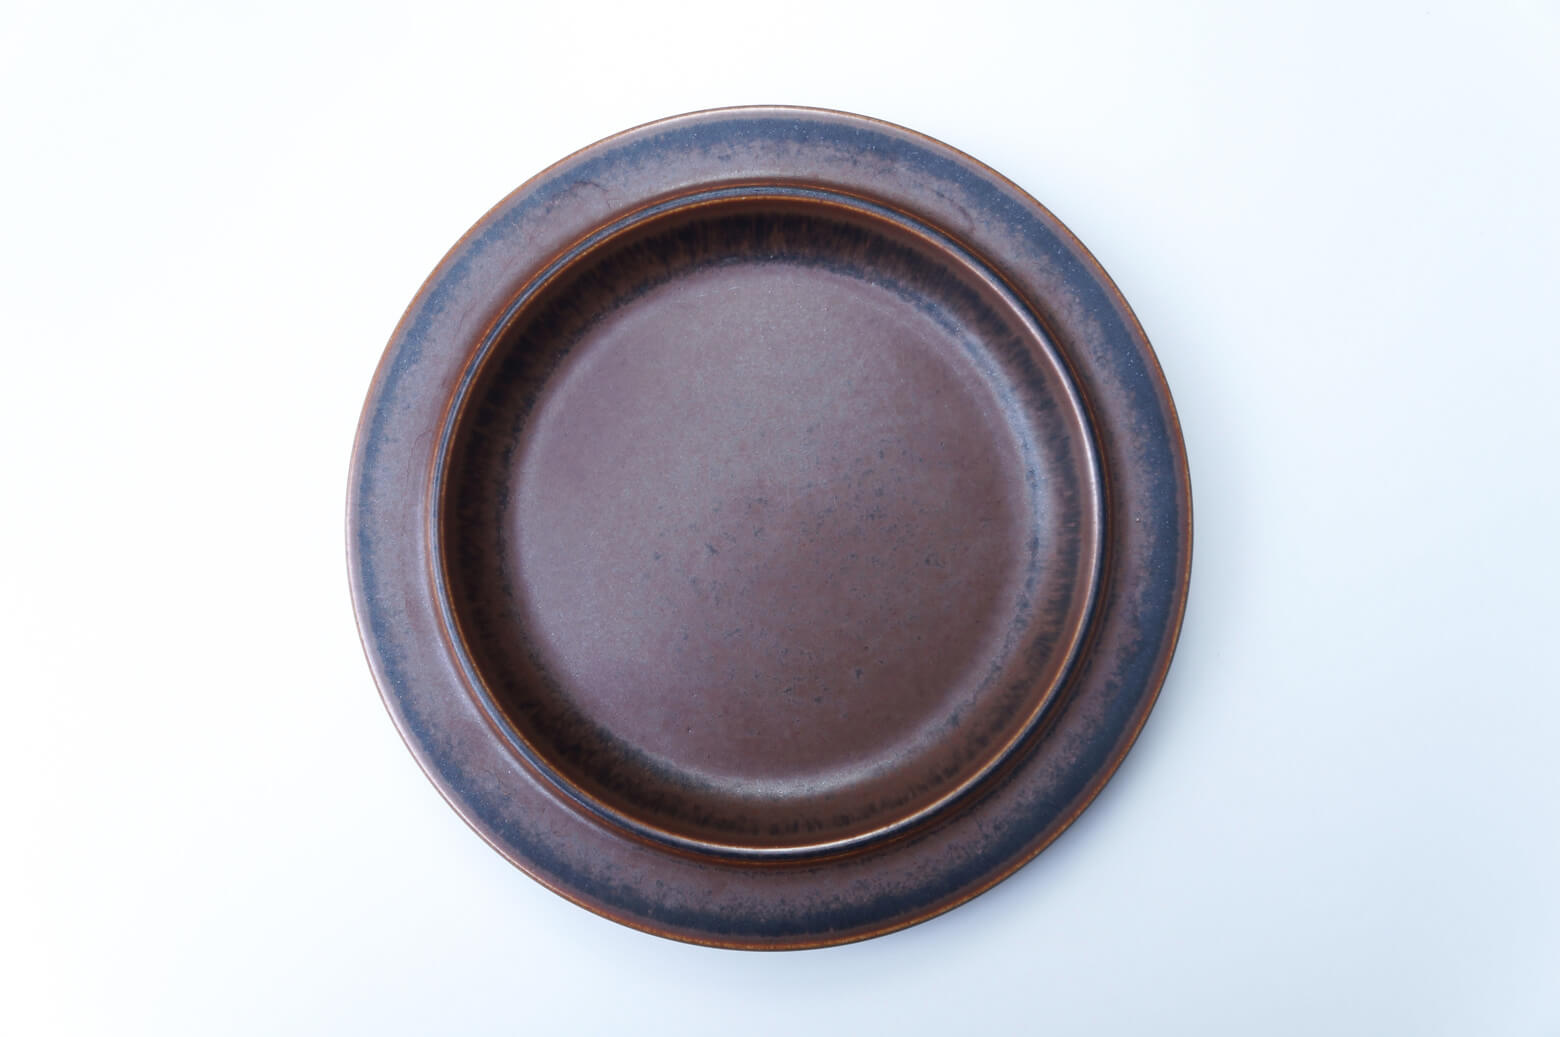 ARABIA Ruska Plate 20cm/アラビア ルスカ プレート 20cm 3